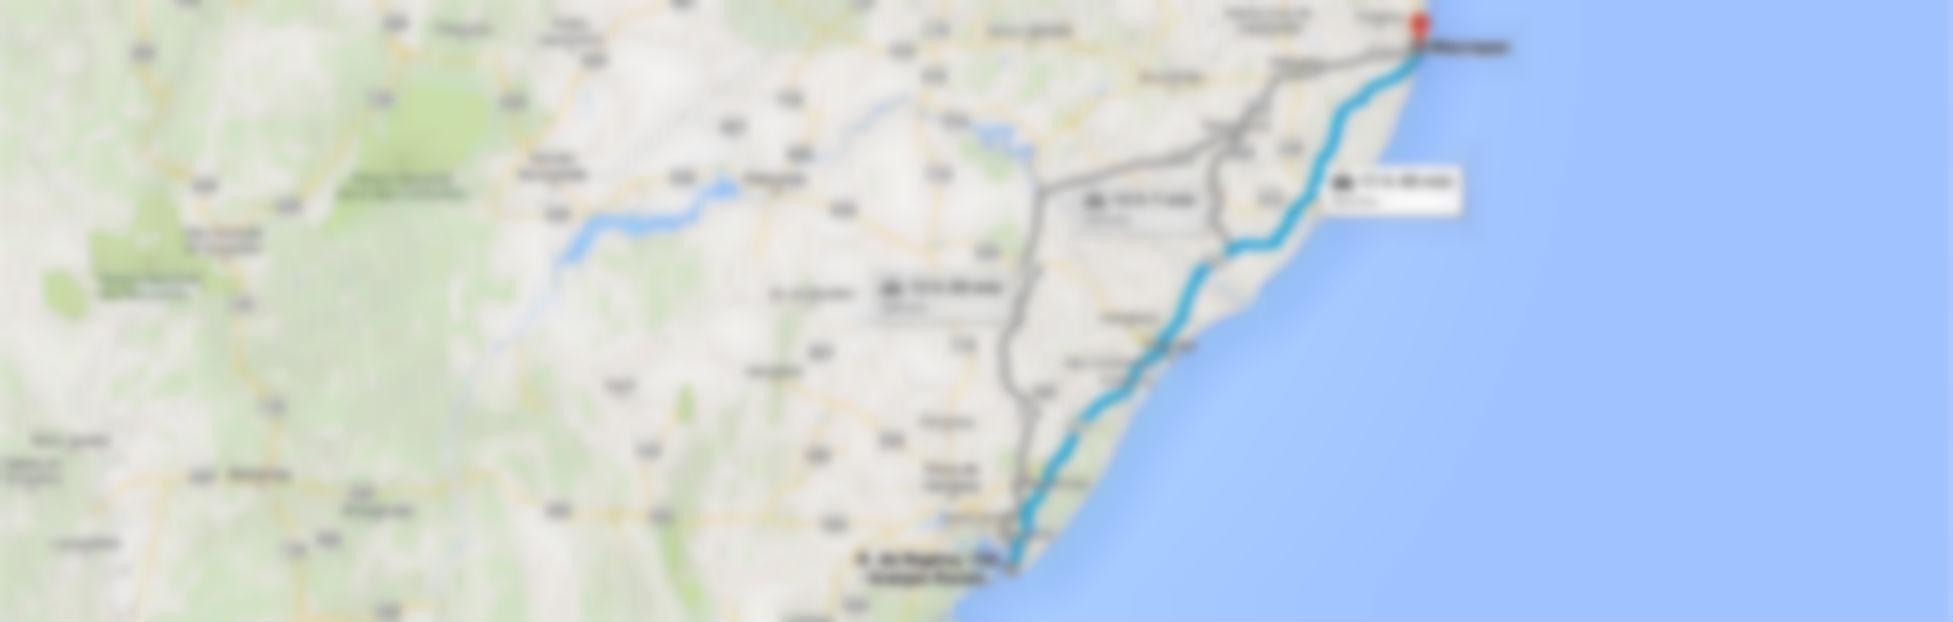 img-mapa-do-brasil